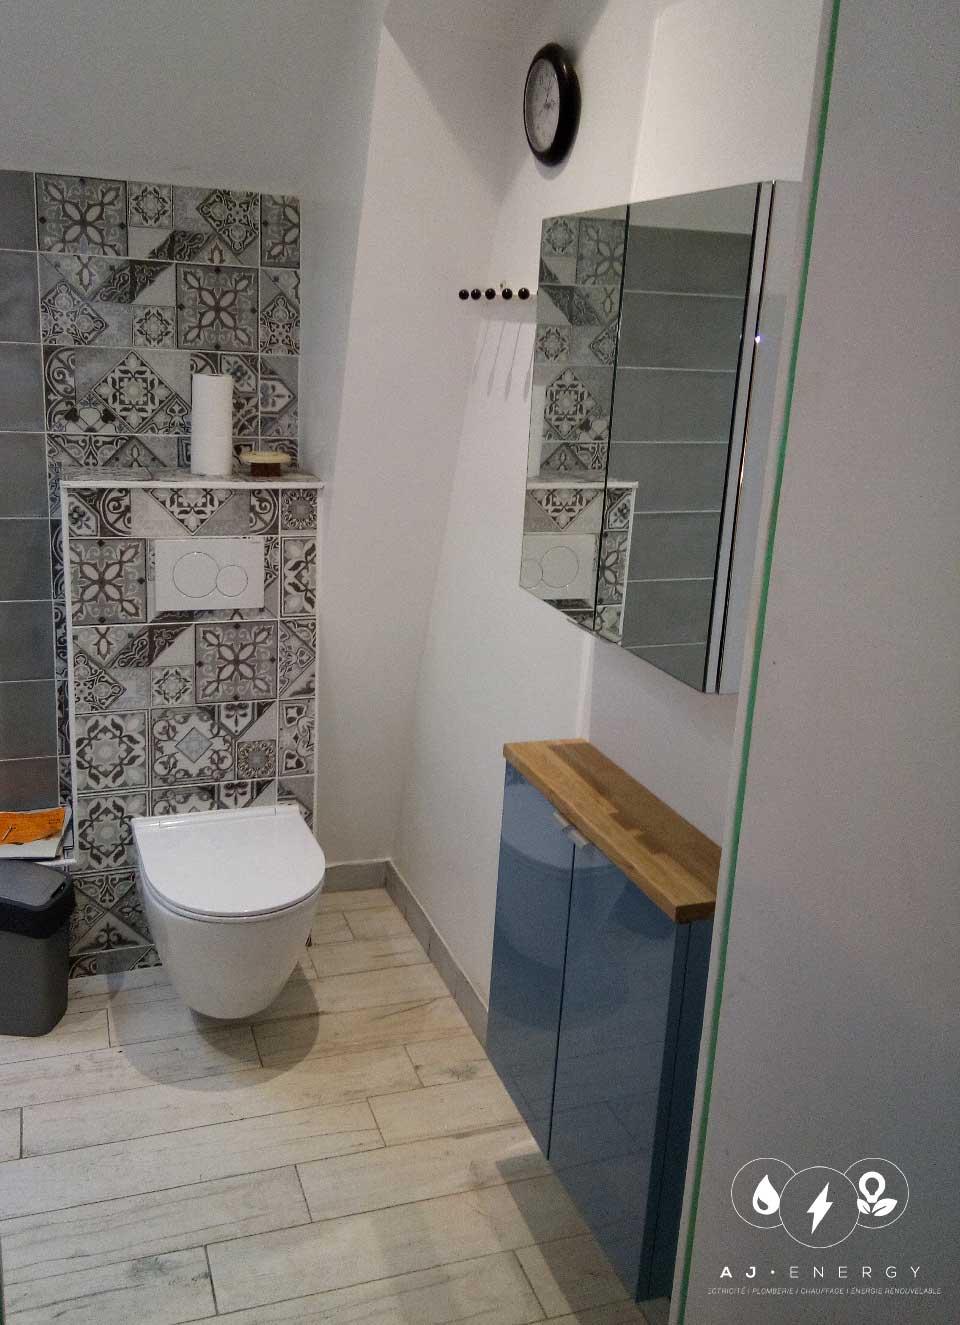 Salle de bain : Baignoire-lavabo- Toilette suspendu.